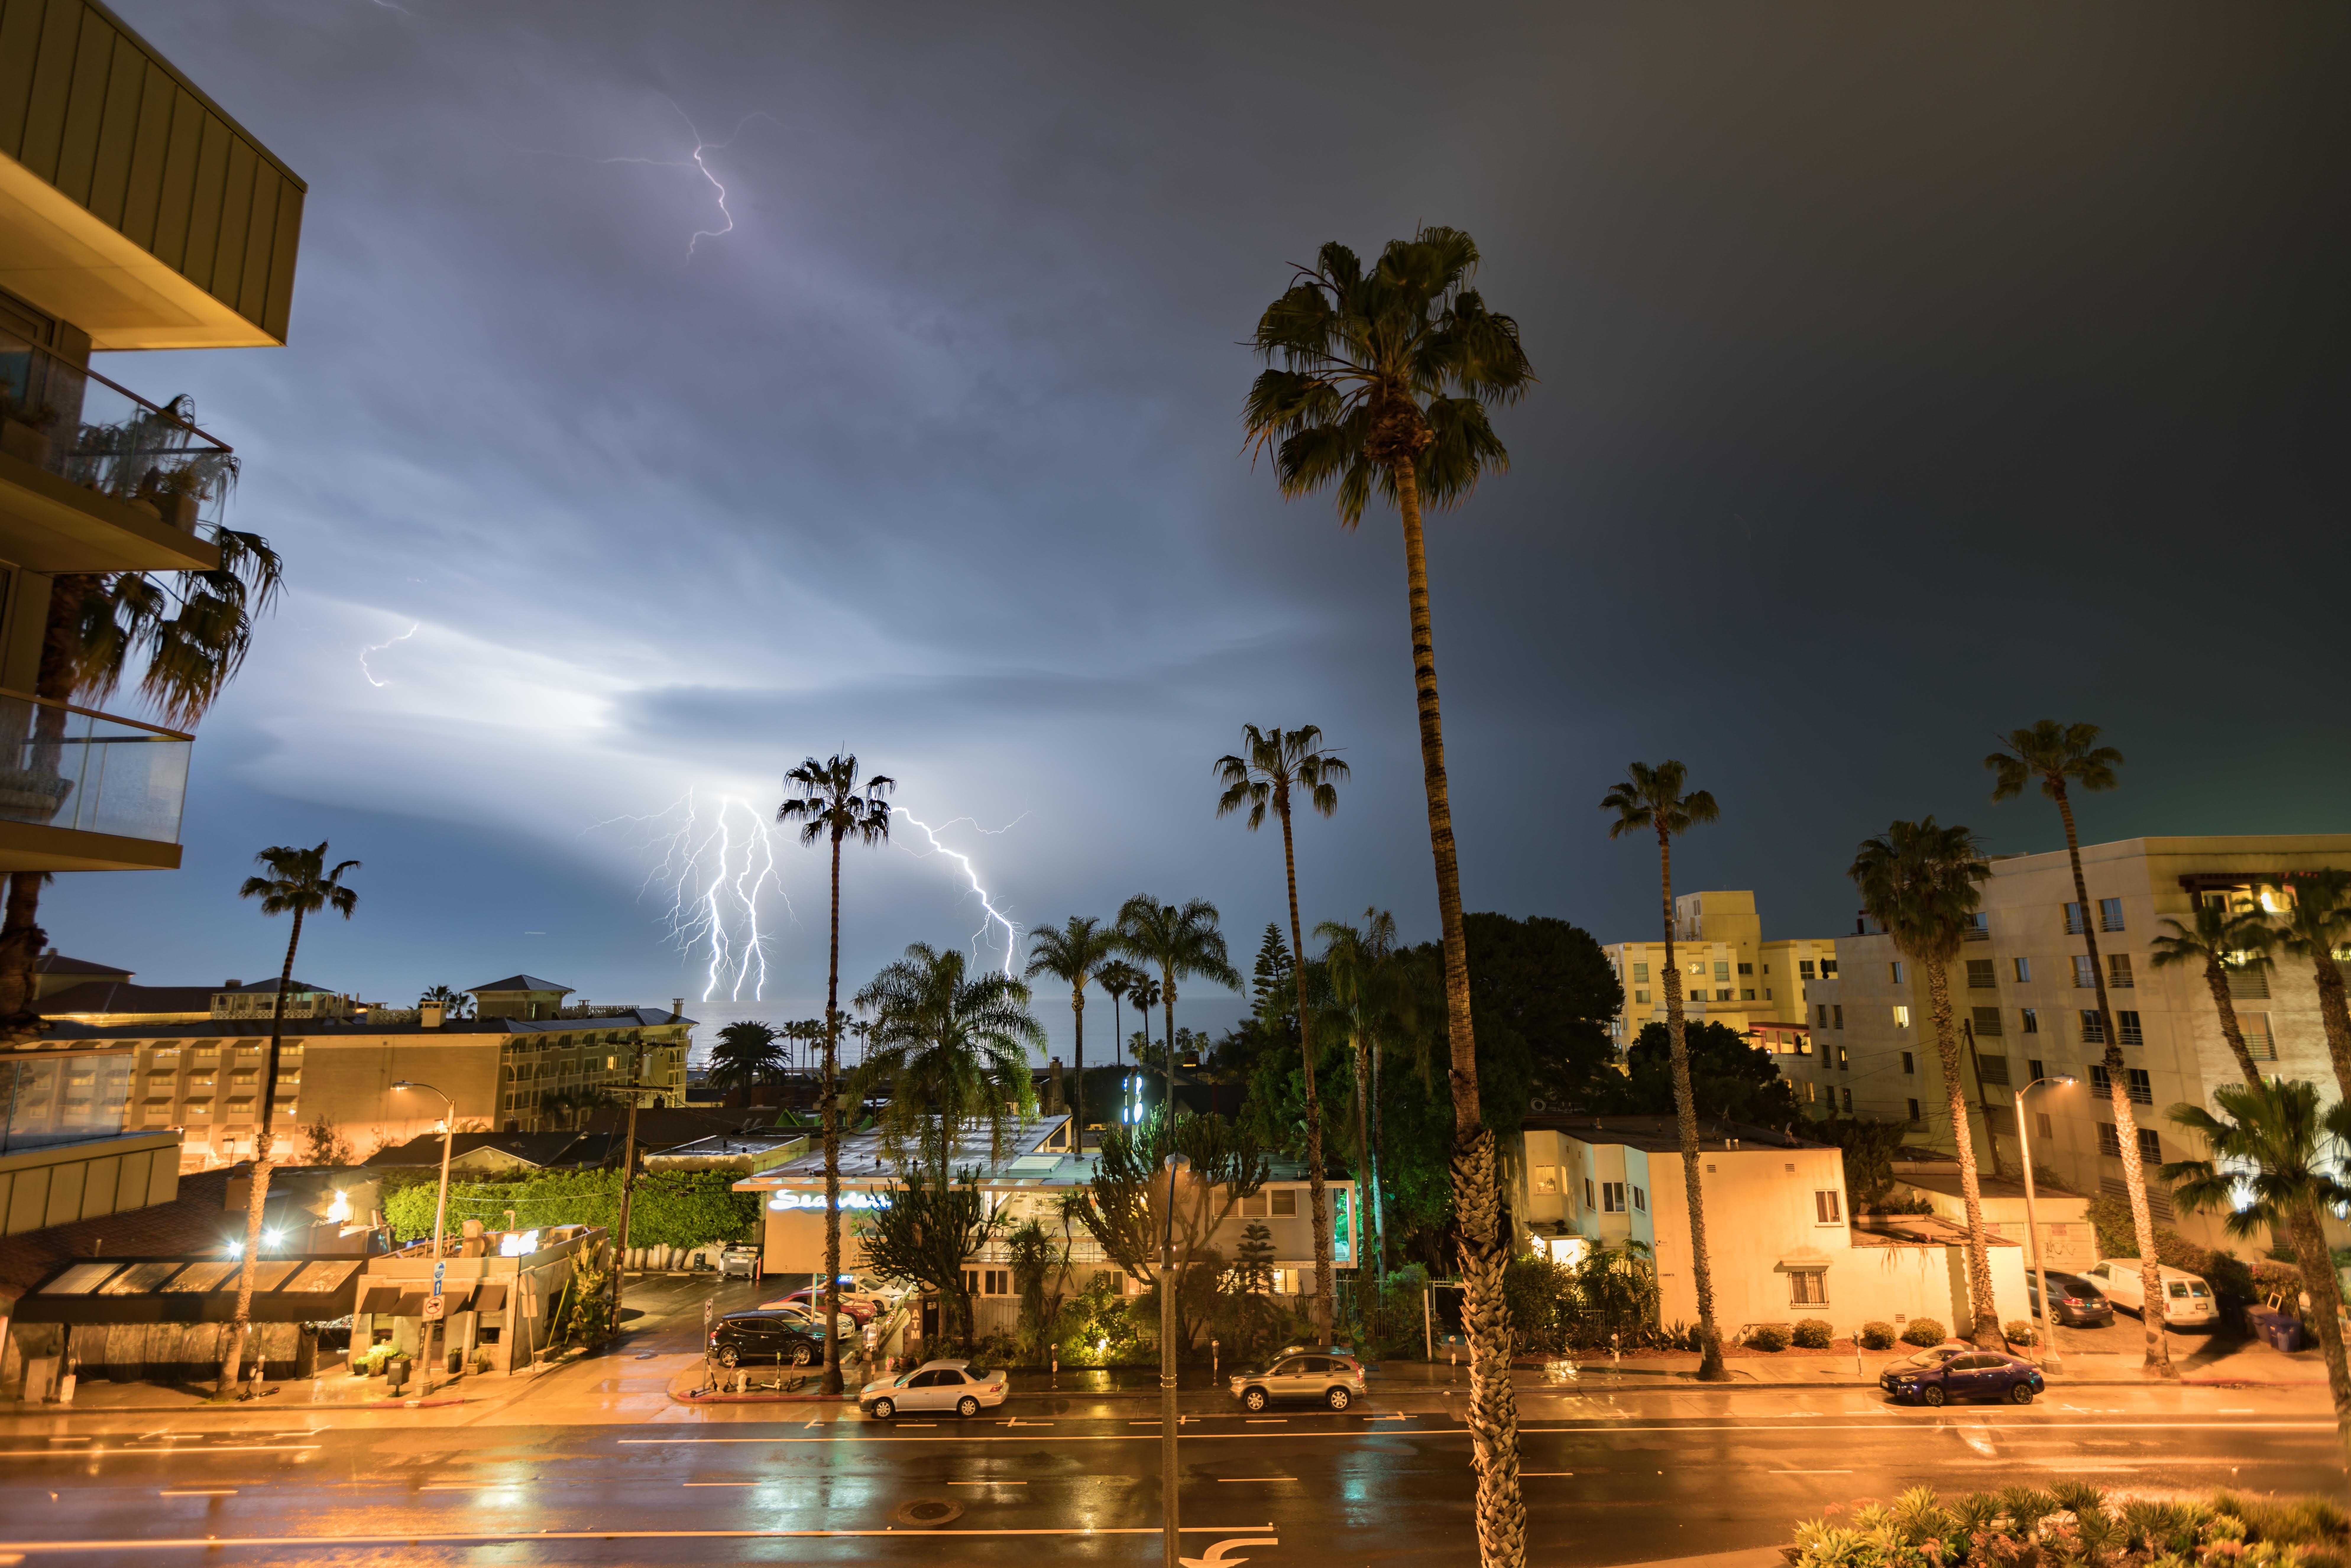 Photos: See LA's night sky electrified by phenomenal lightning show